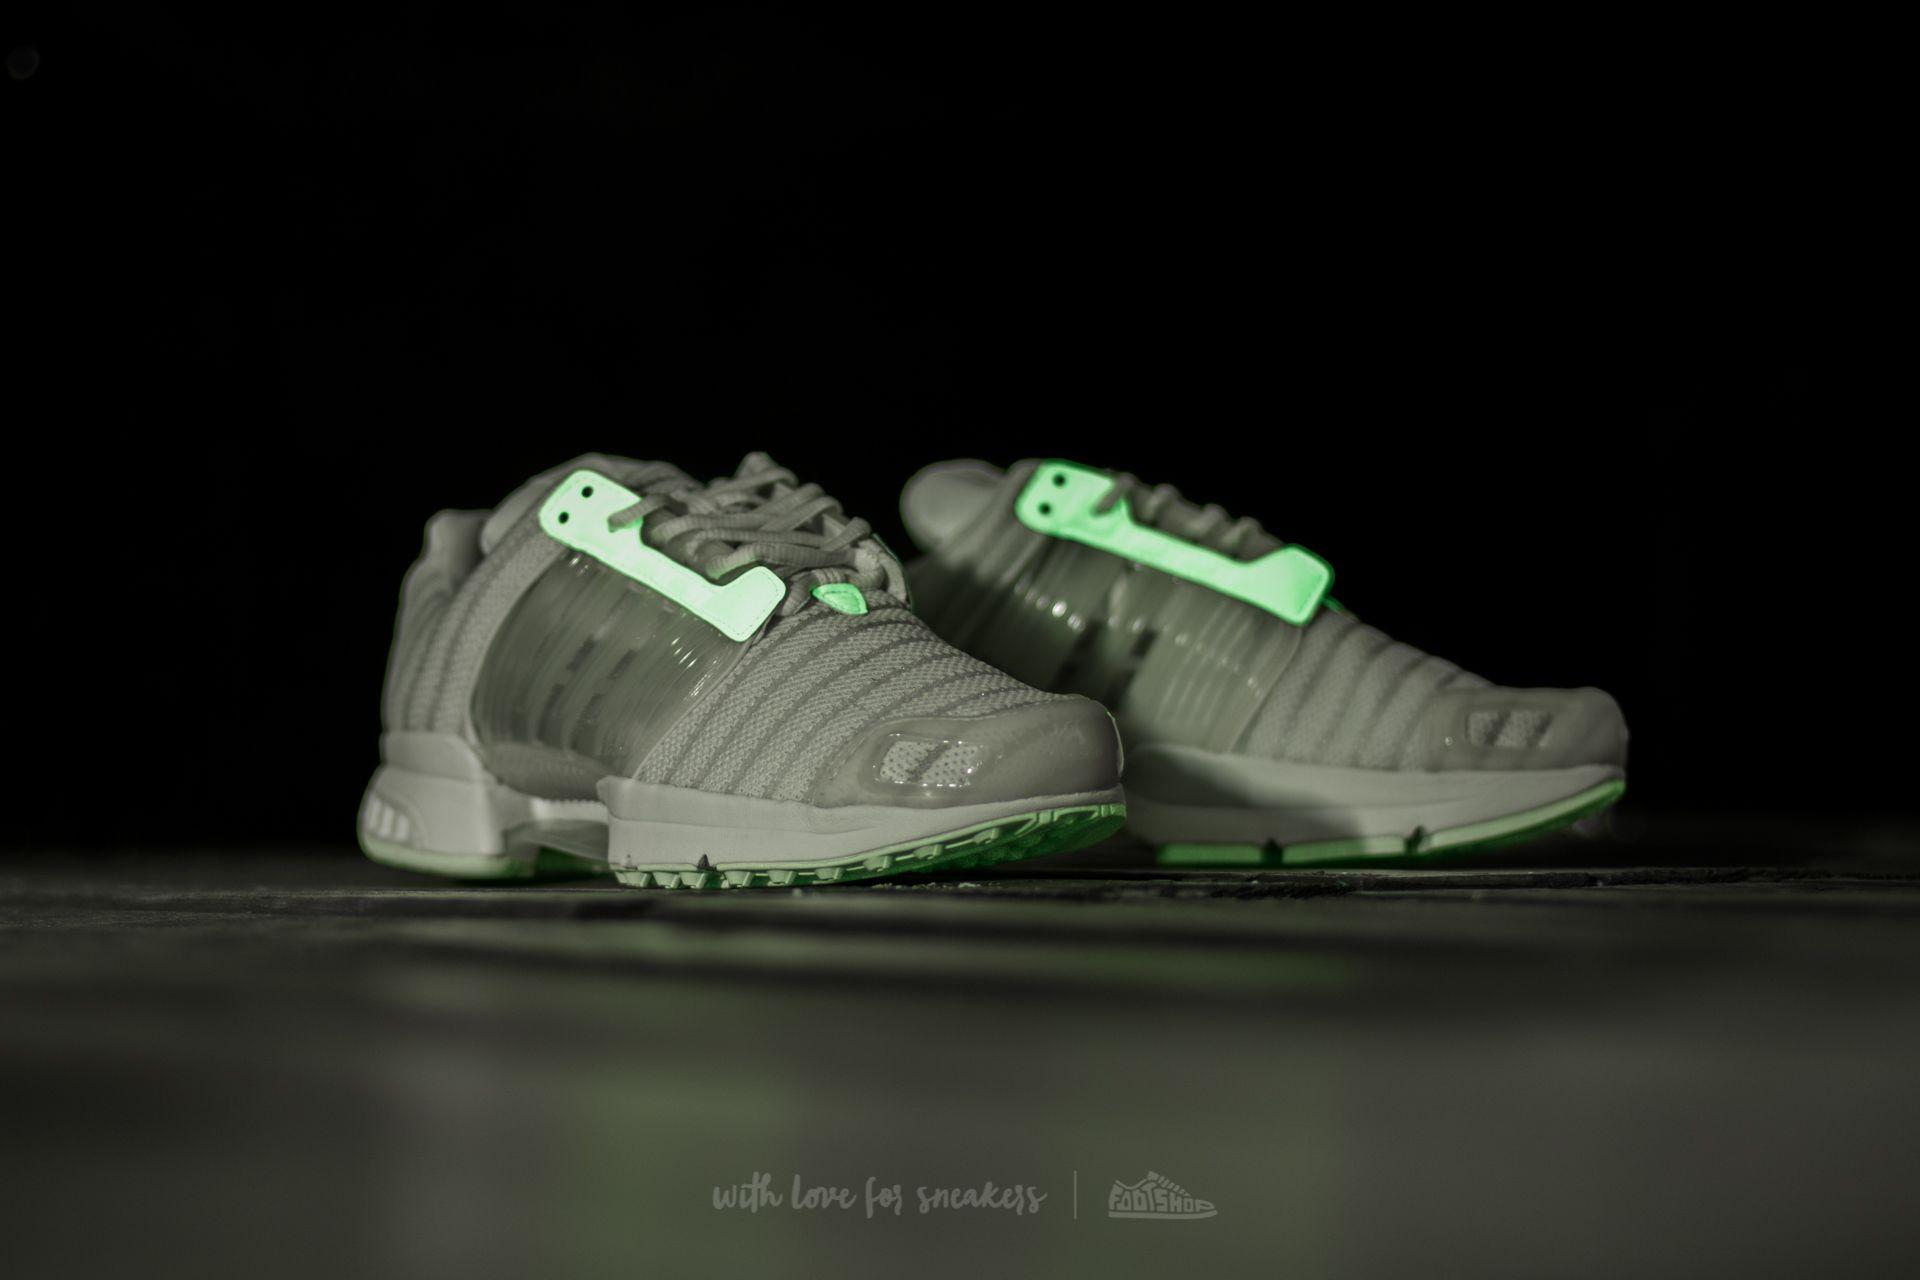 S Wish 1 Adidas White Climacool Consortium X Sneakerboy eFtw 8nP0wOk